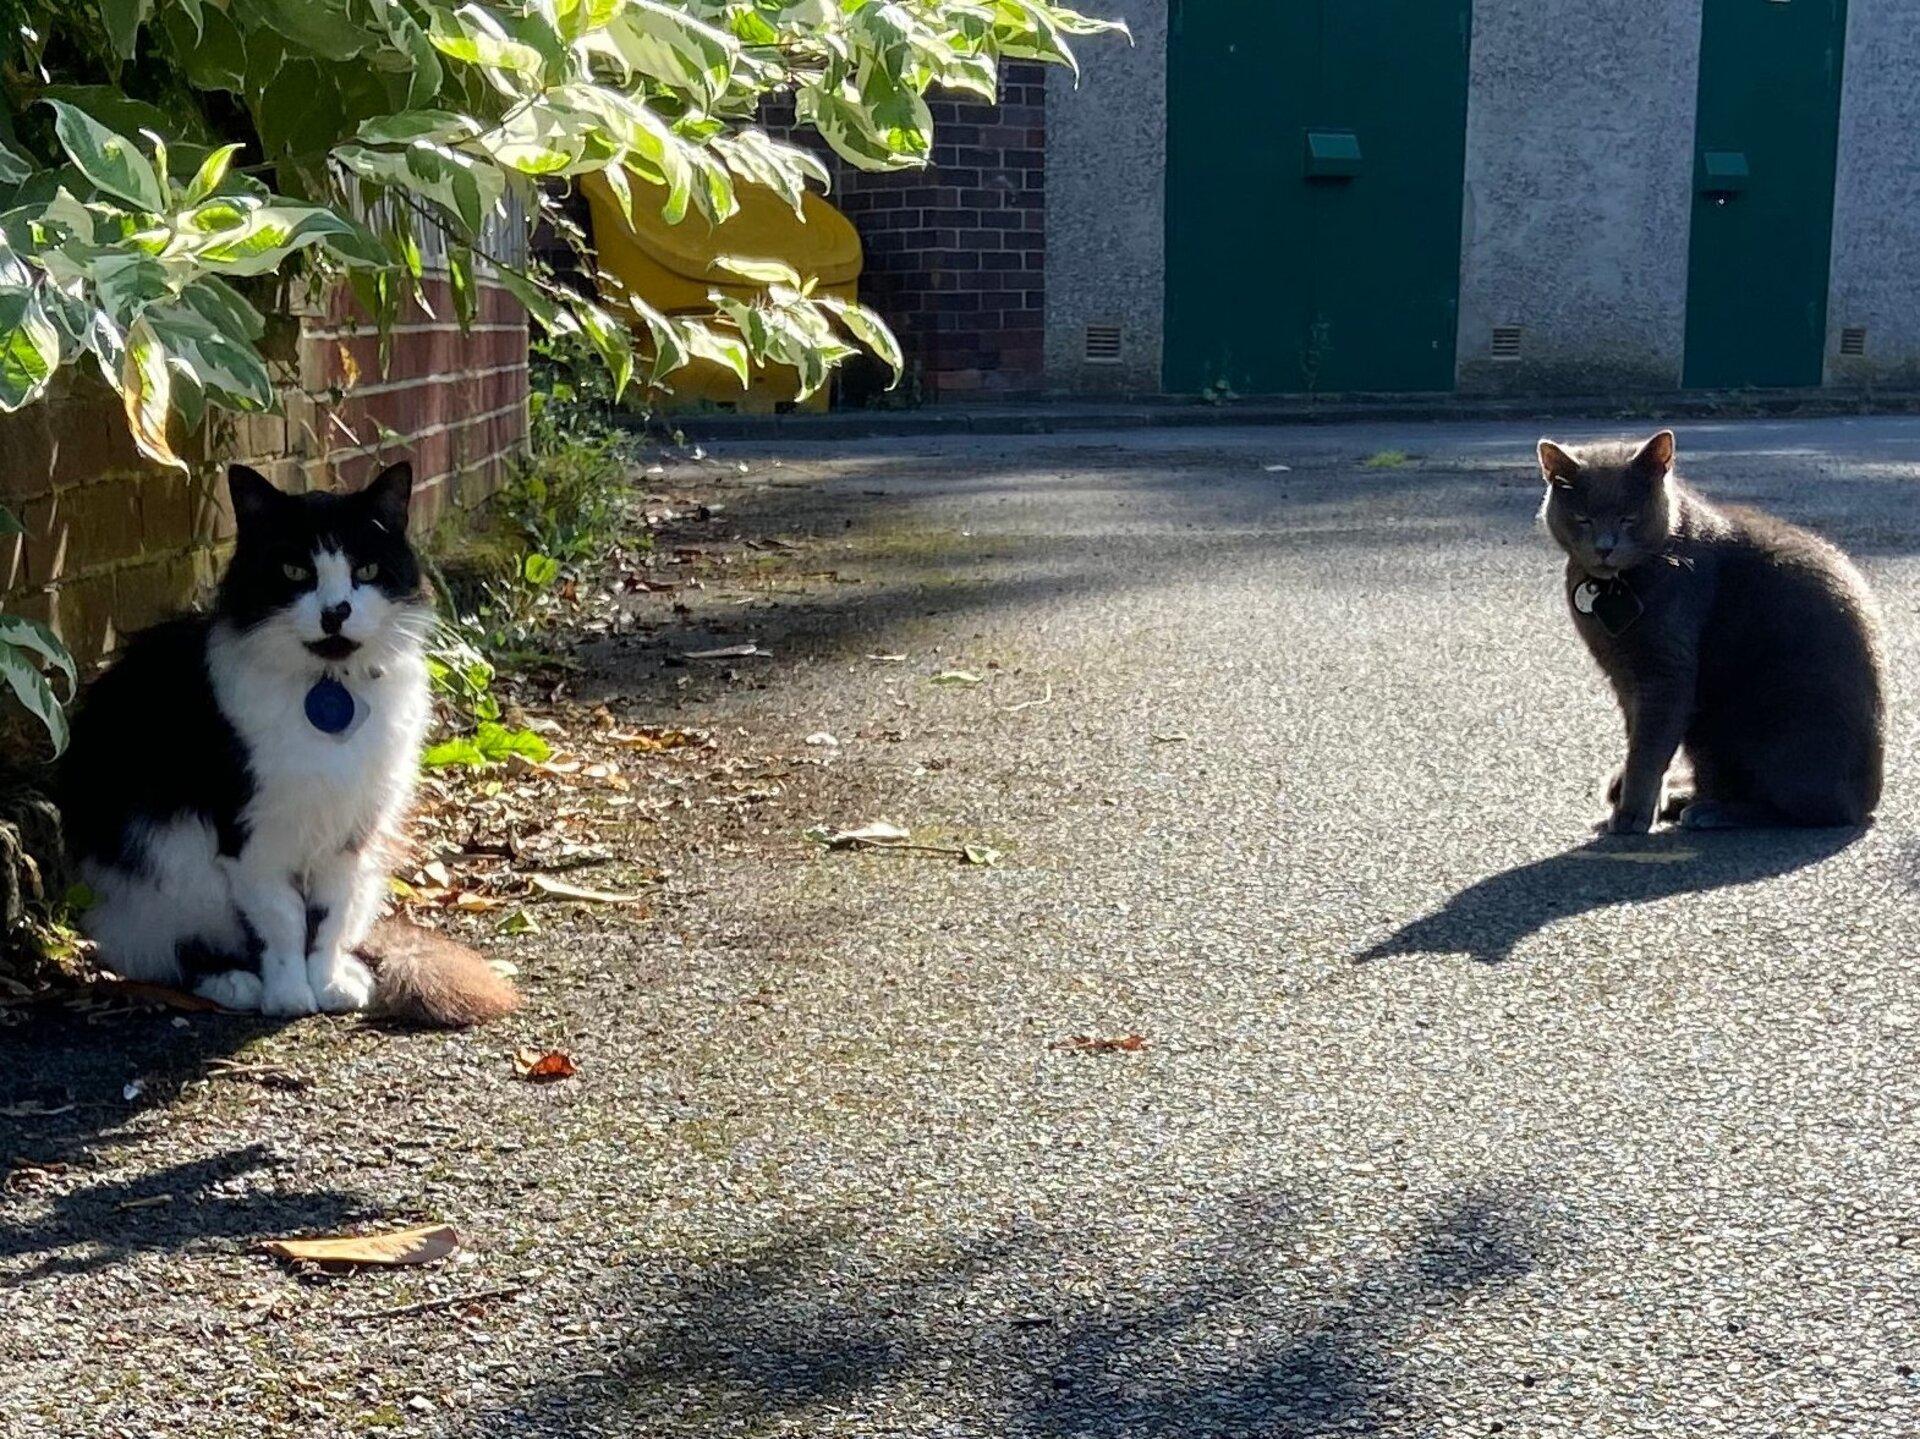 Felis silvestris (domestic cat) 'Mr Mittens' Felis silvestris (domestic cat) 'Willow' Durham Home — Tue 07 Sep 2021 10-08-56 BST — 1157853868